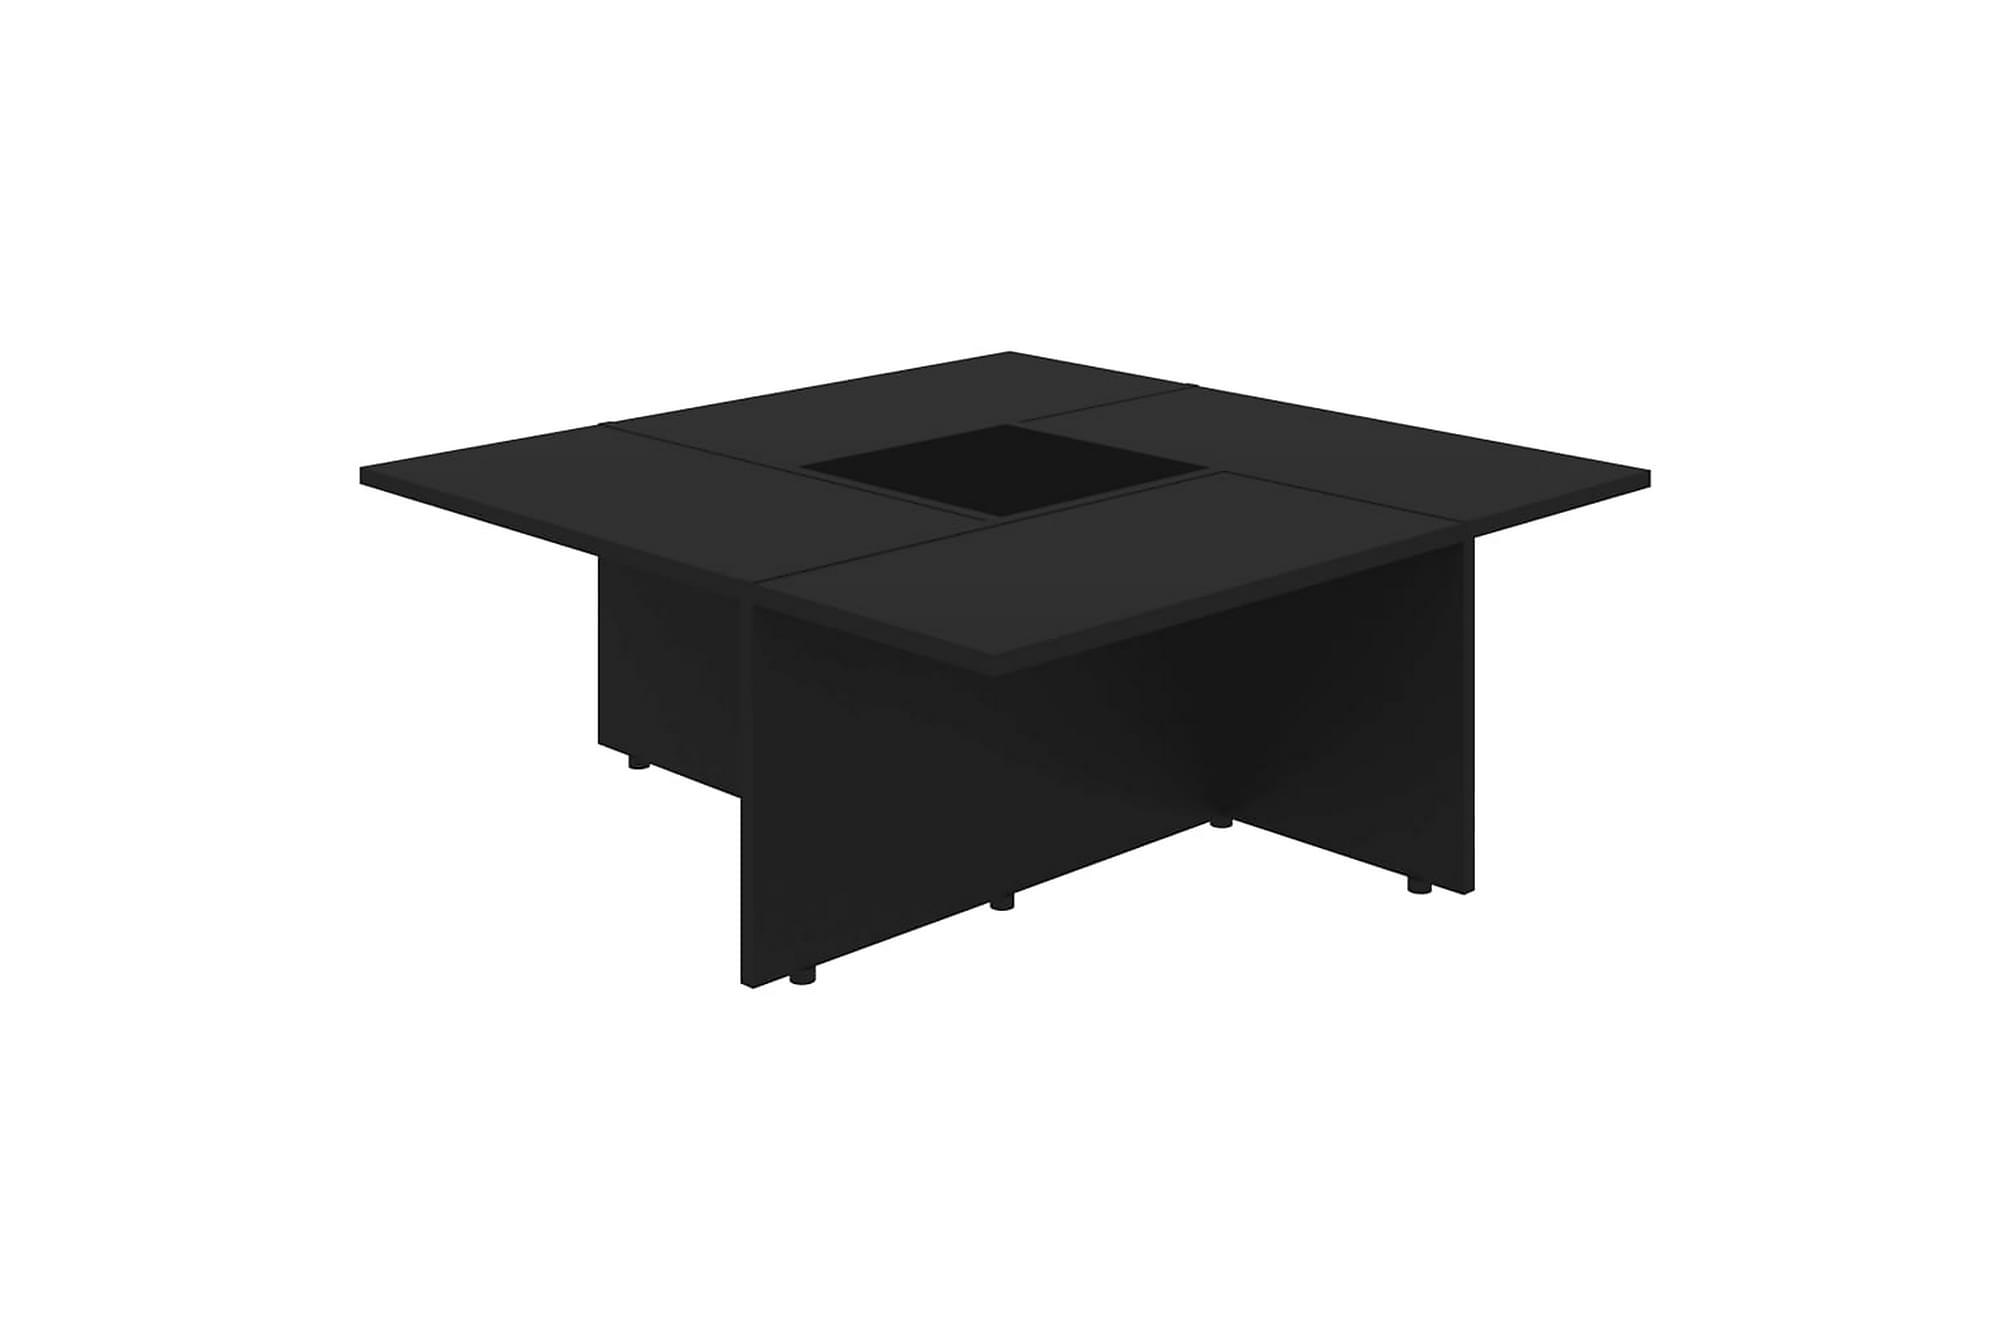 Soffbord svart 79